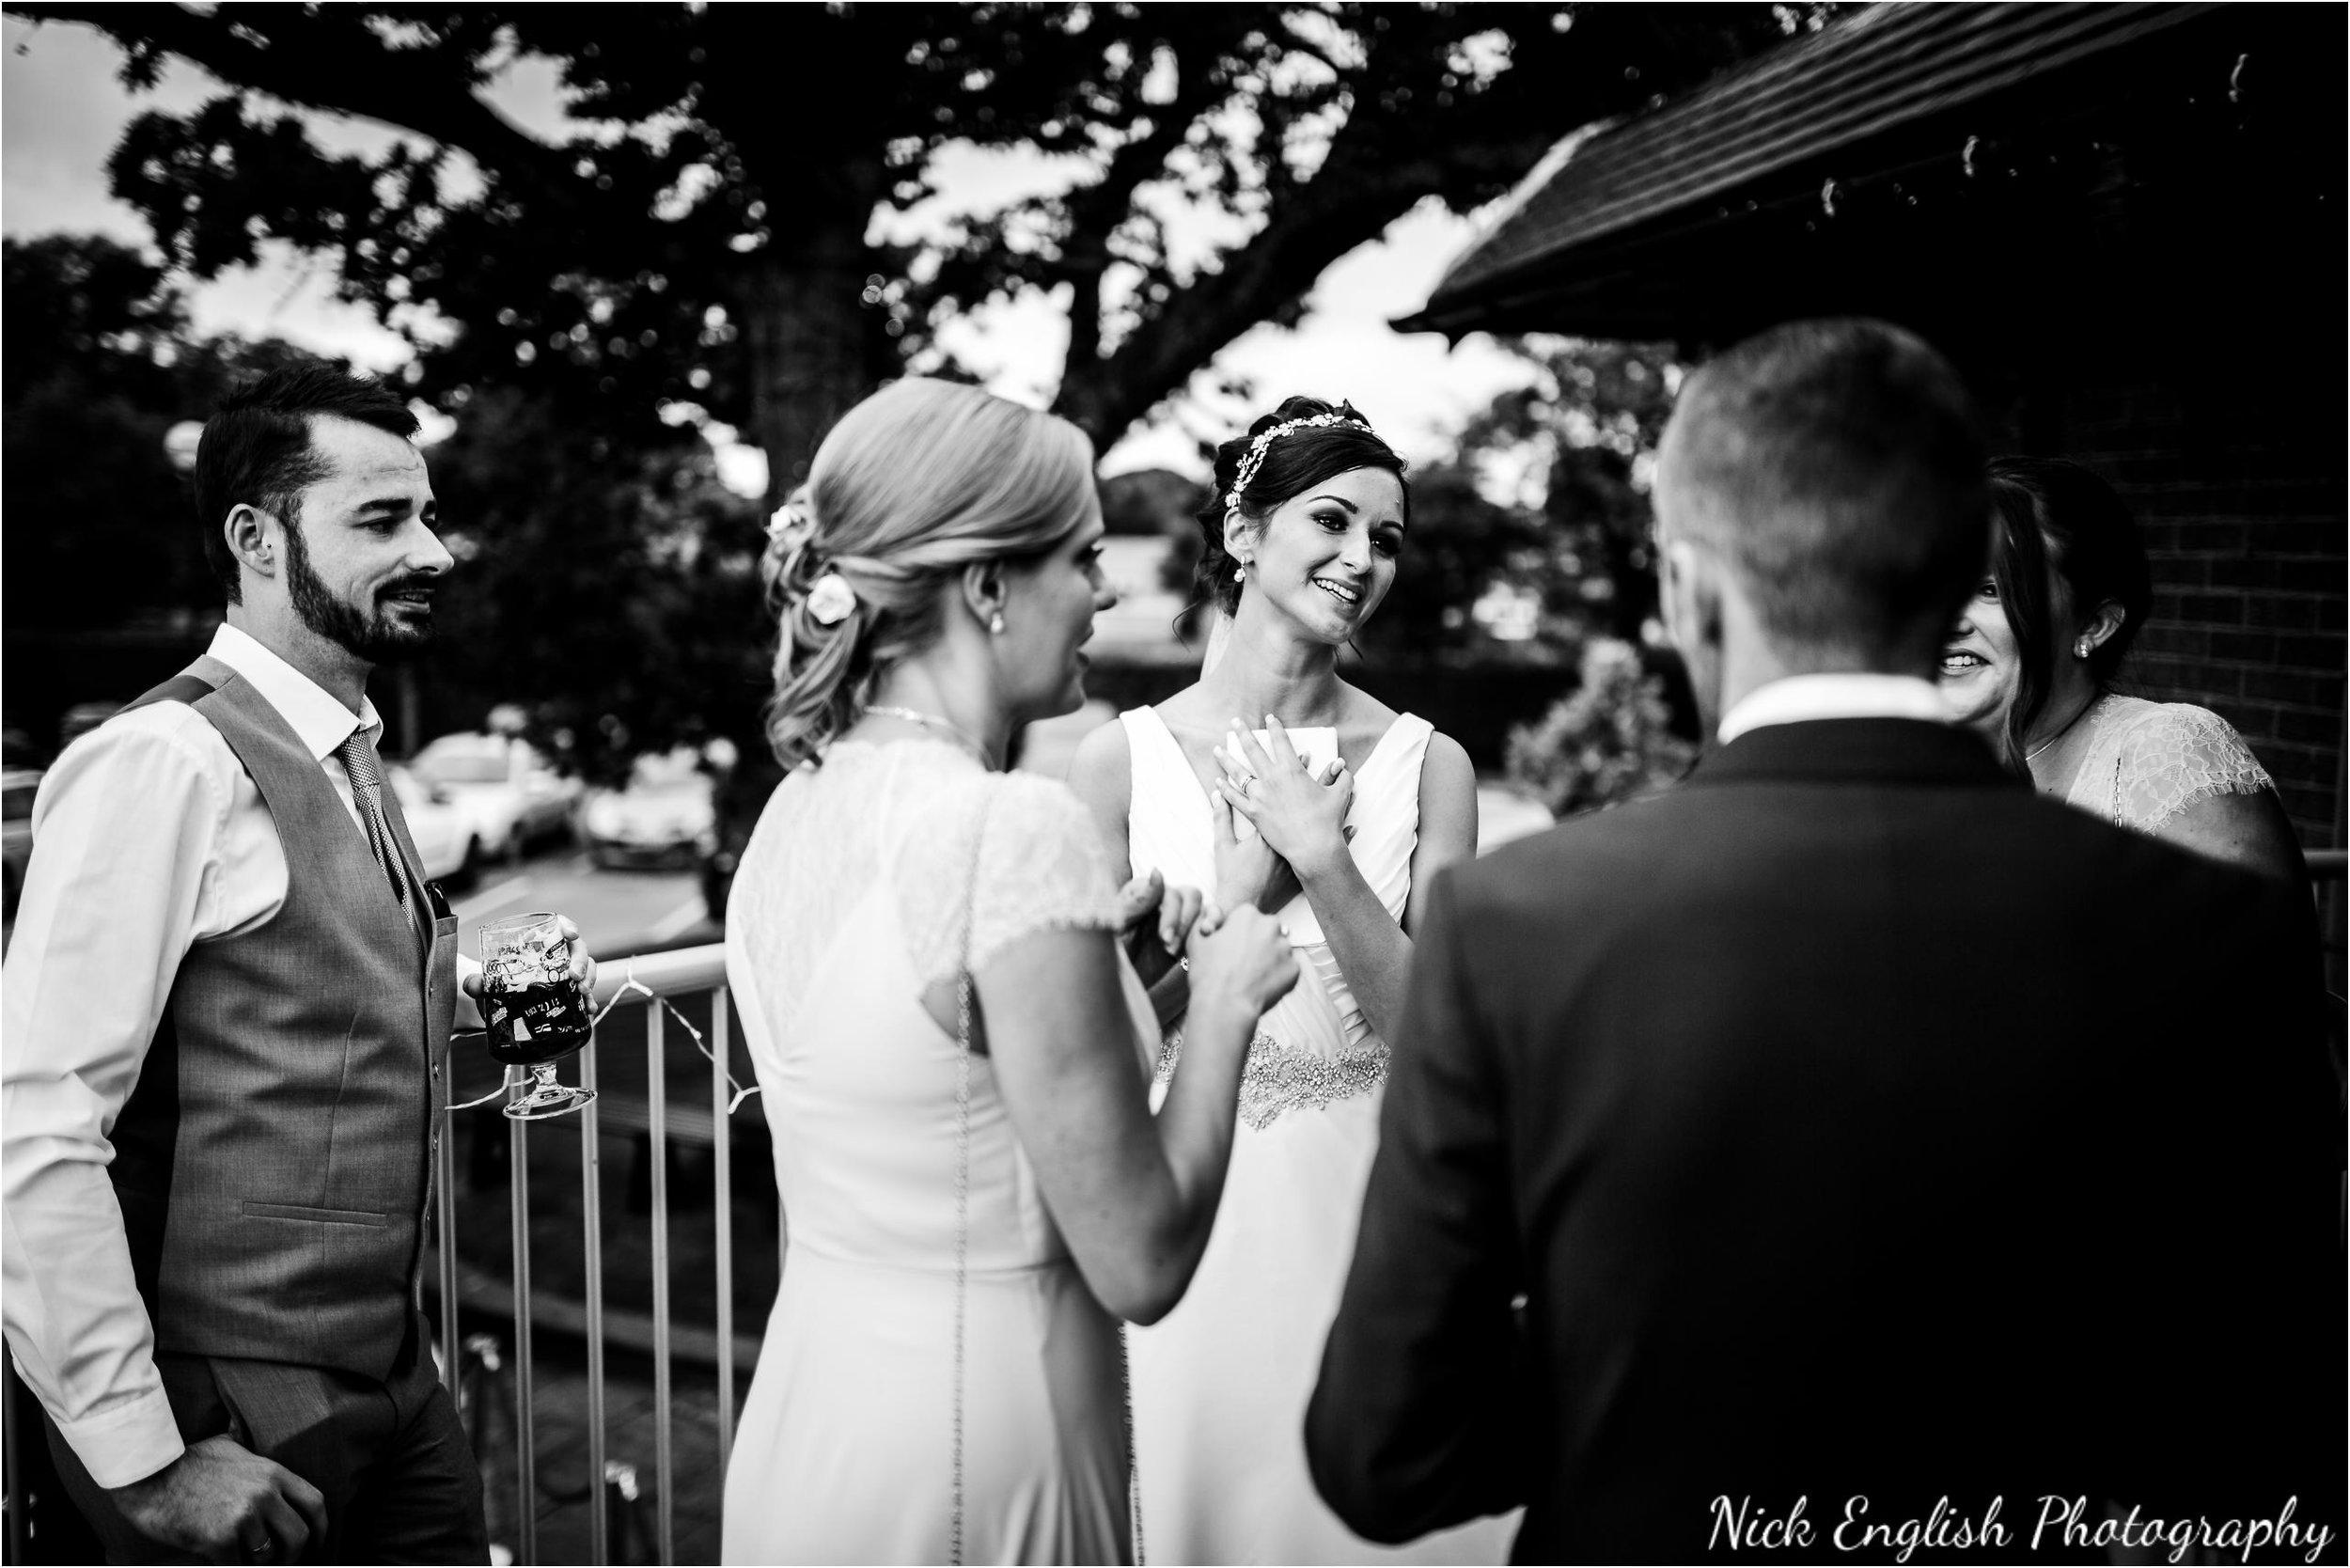 Emily David Wedding Photographs at Barton Grange Preston by Nick English Photography 214jpg.jpeg